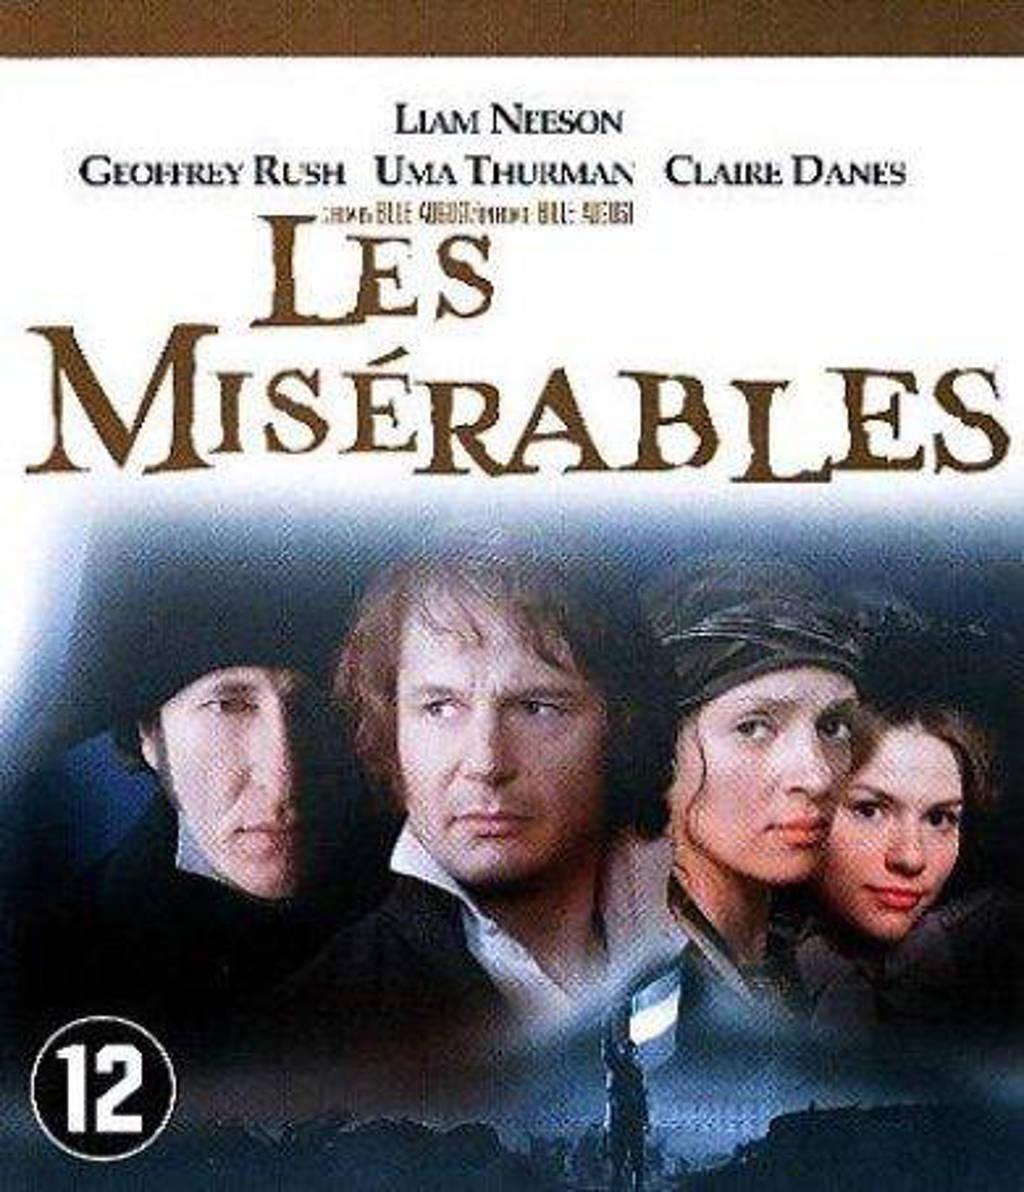 Les miserables (1998) (Blu-ray)